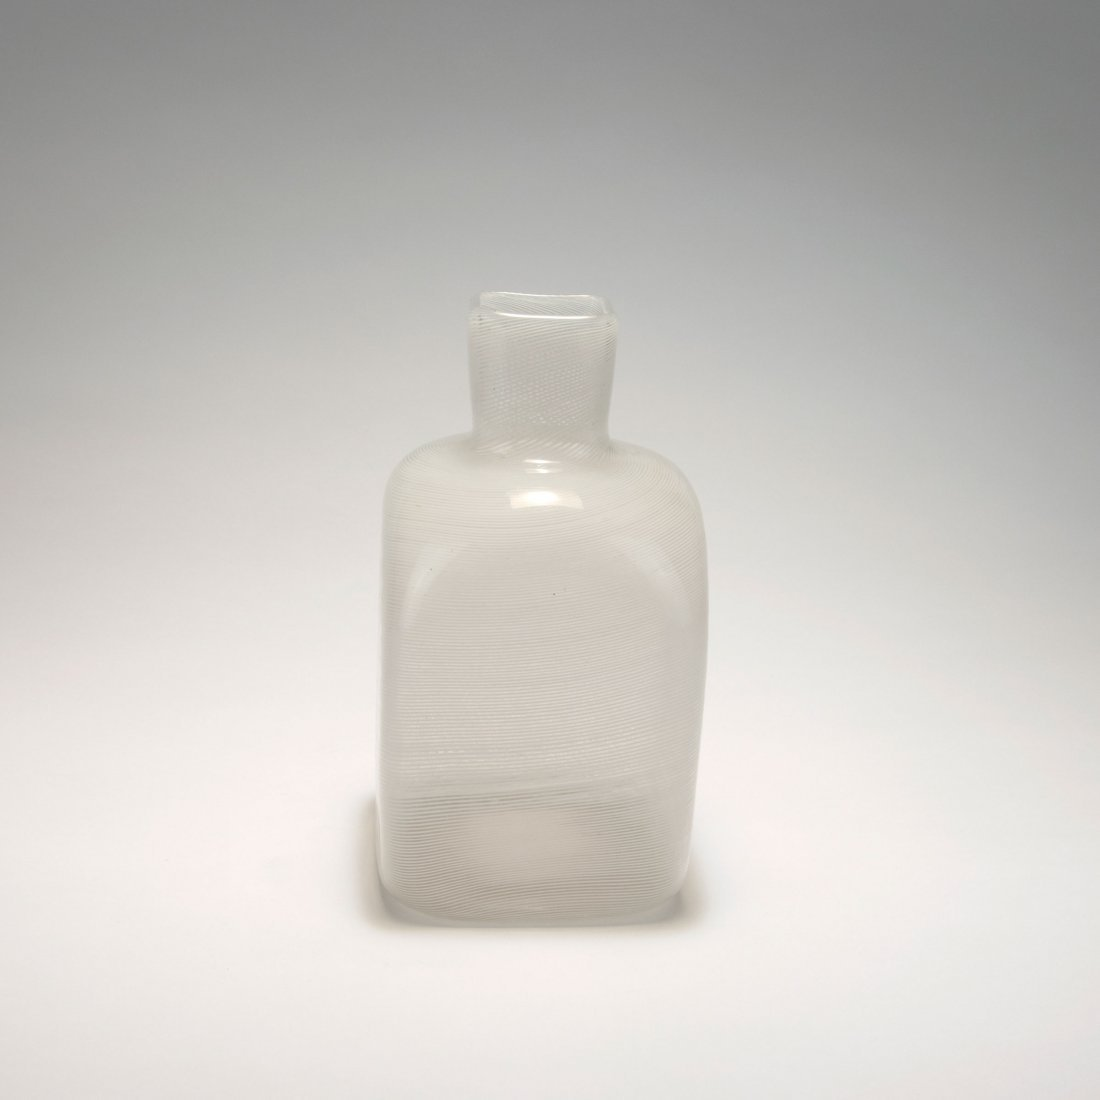 Bottle-shaped 'Mezza filigrana' vase, 1934 - 2